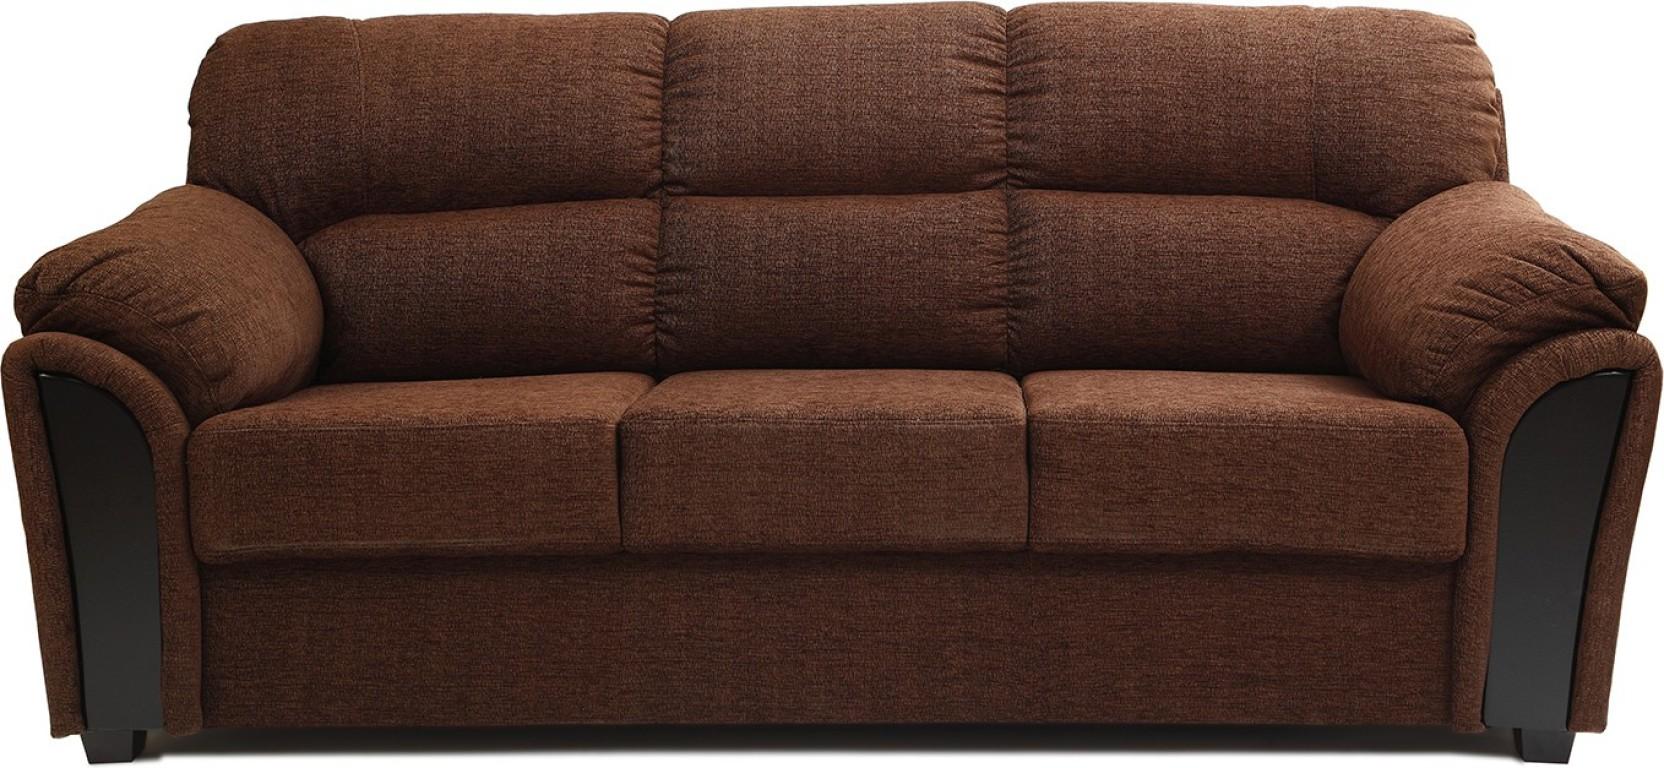 Hometown Ohio Br Fabric 3 Seater Sofa Price In India